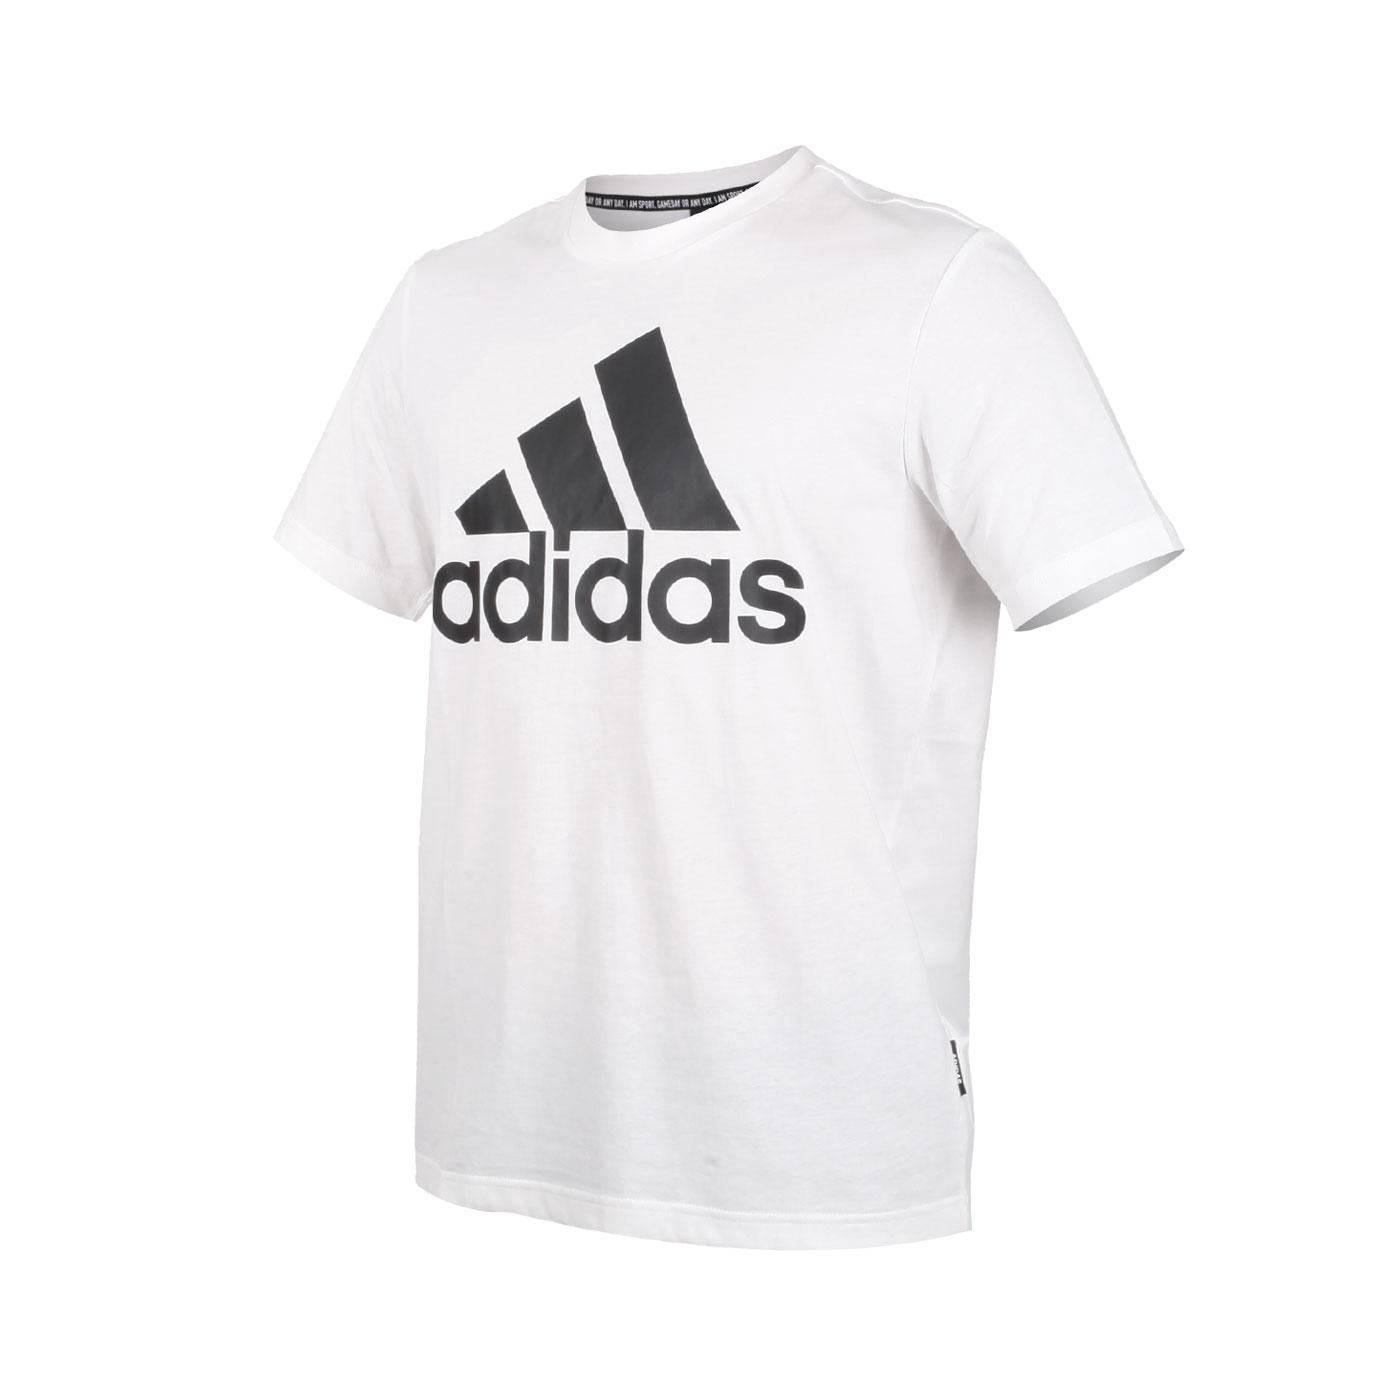 ADIDAS 男款短袖T恤 GC7348 - 白黑